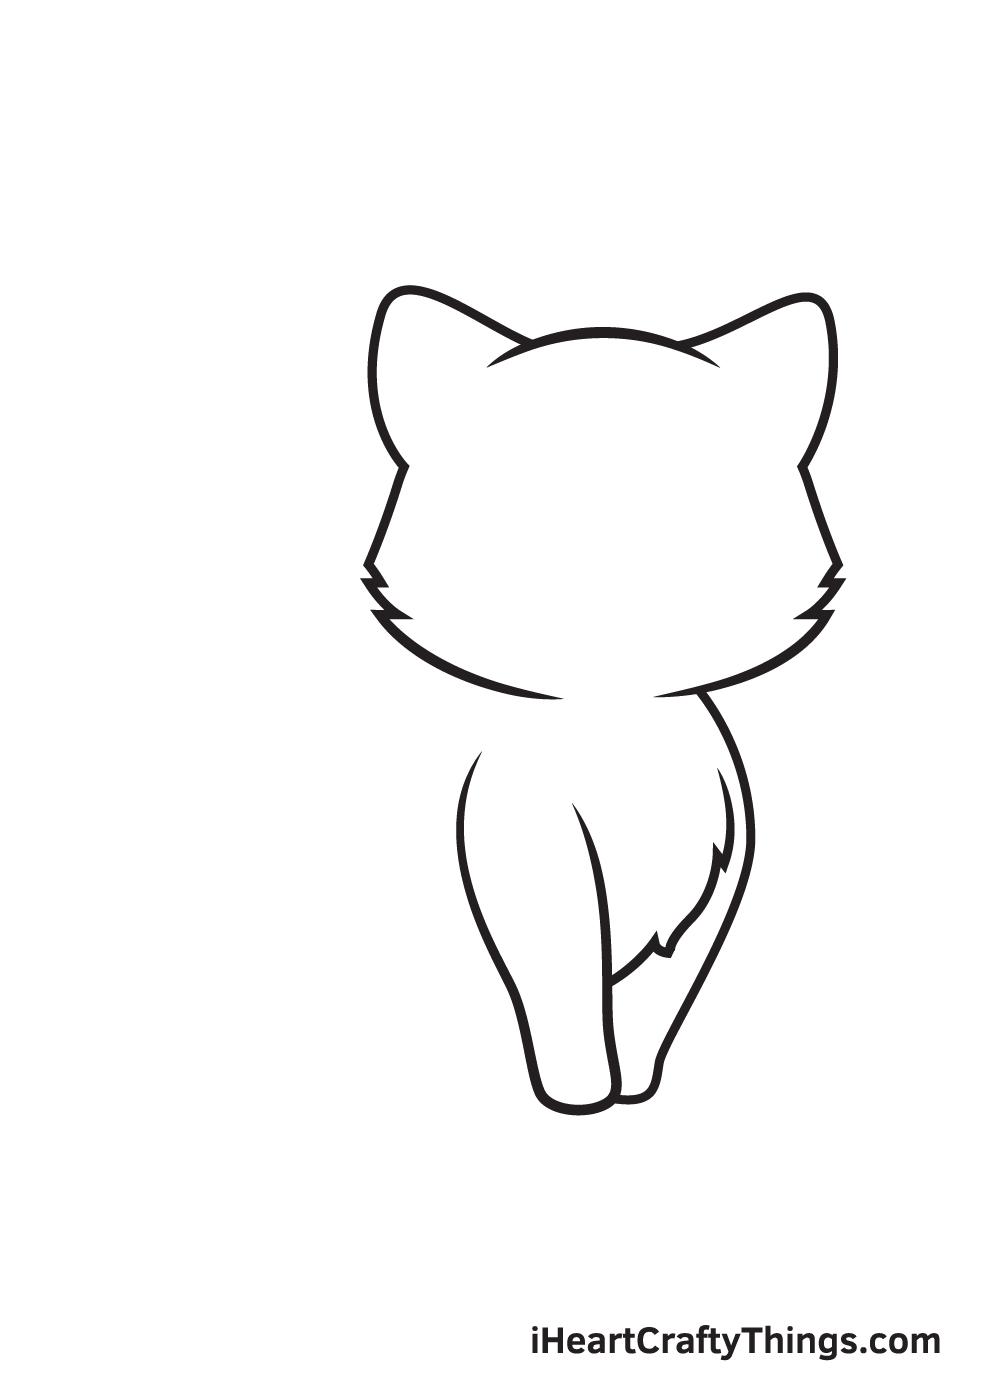 Kitten Drawing – Step 3